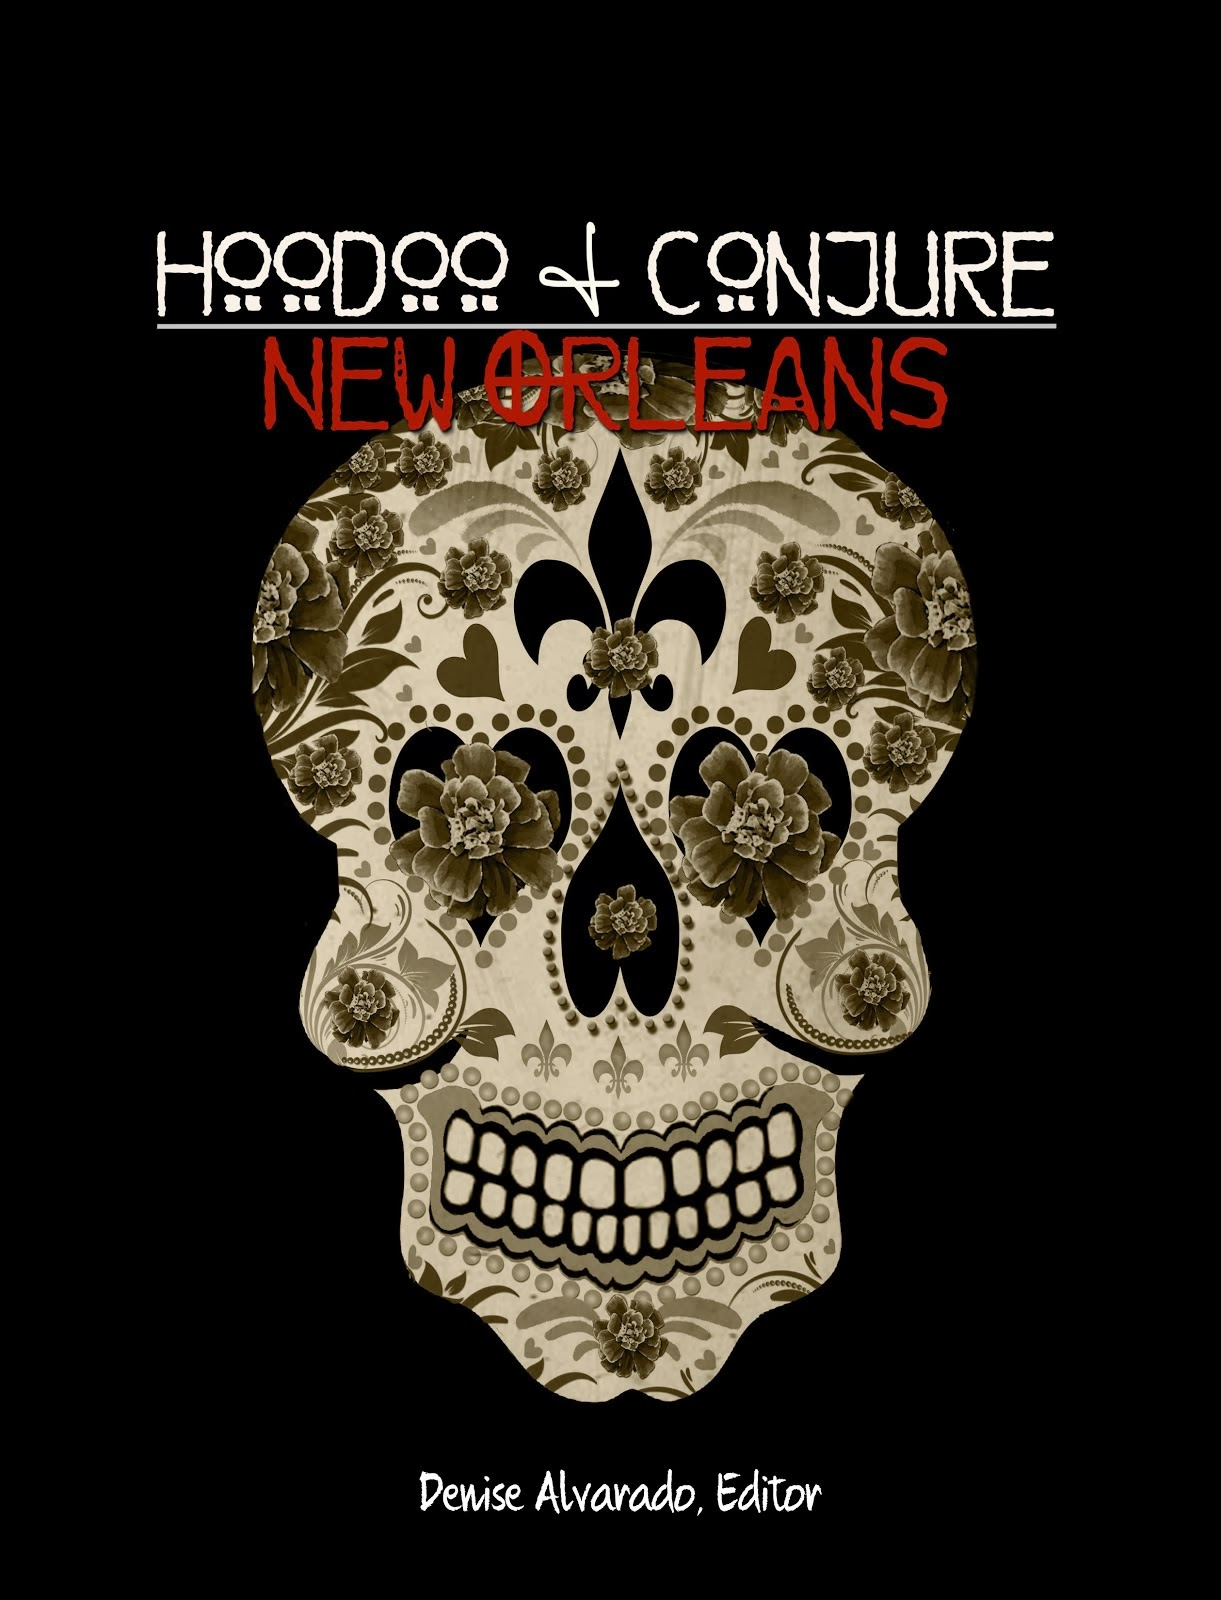 Hoodoo & Conjure Magazine